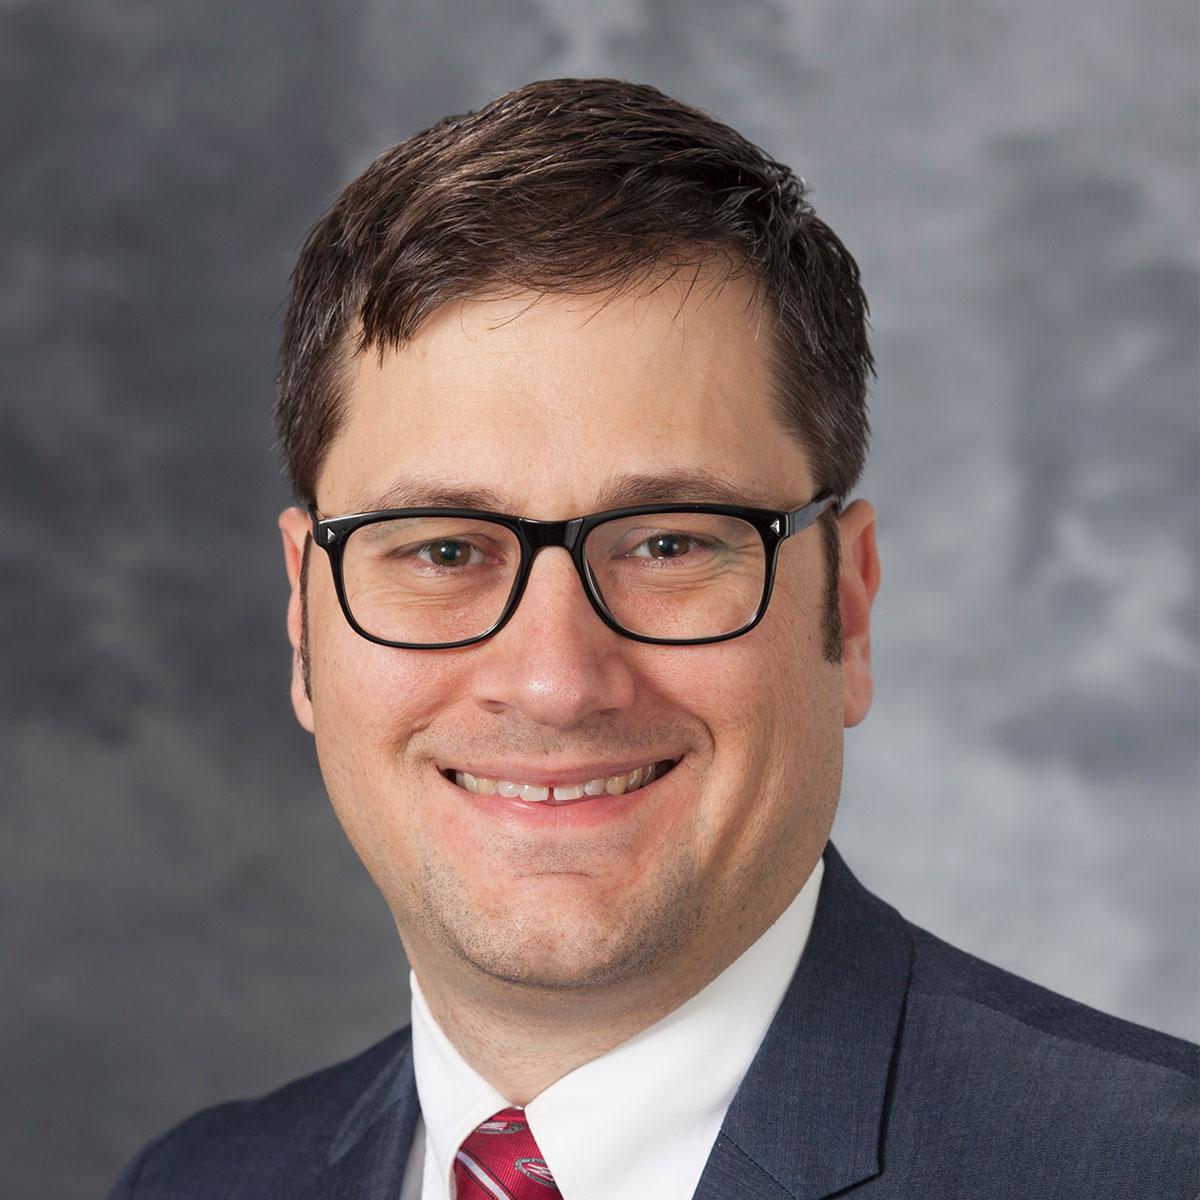 Picture of Alan McMillan, PhD